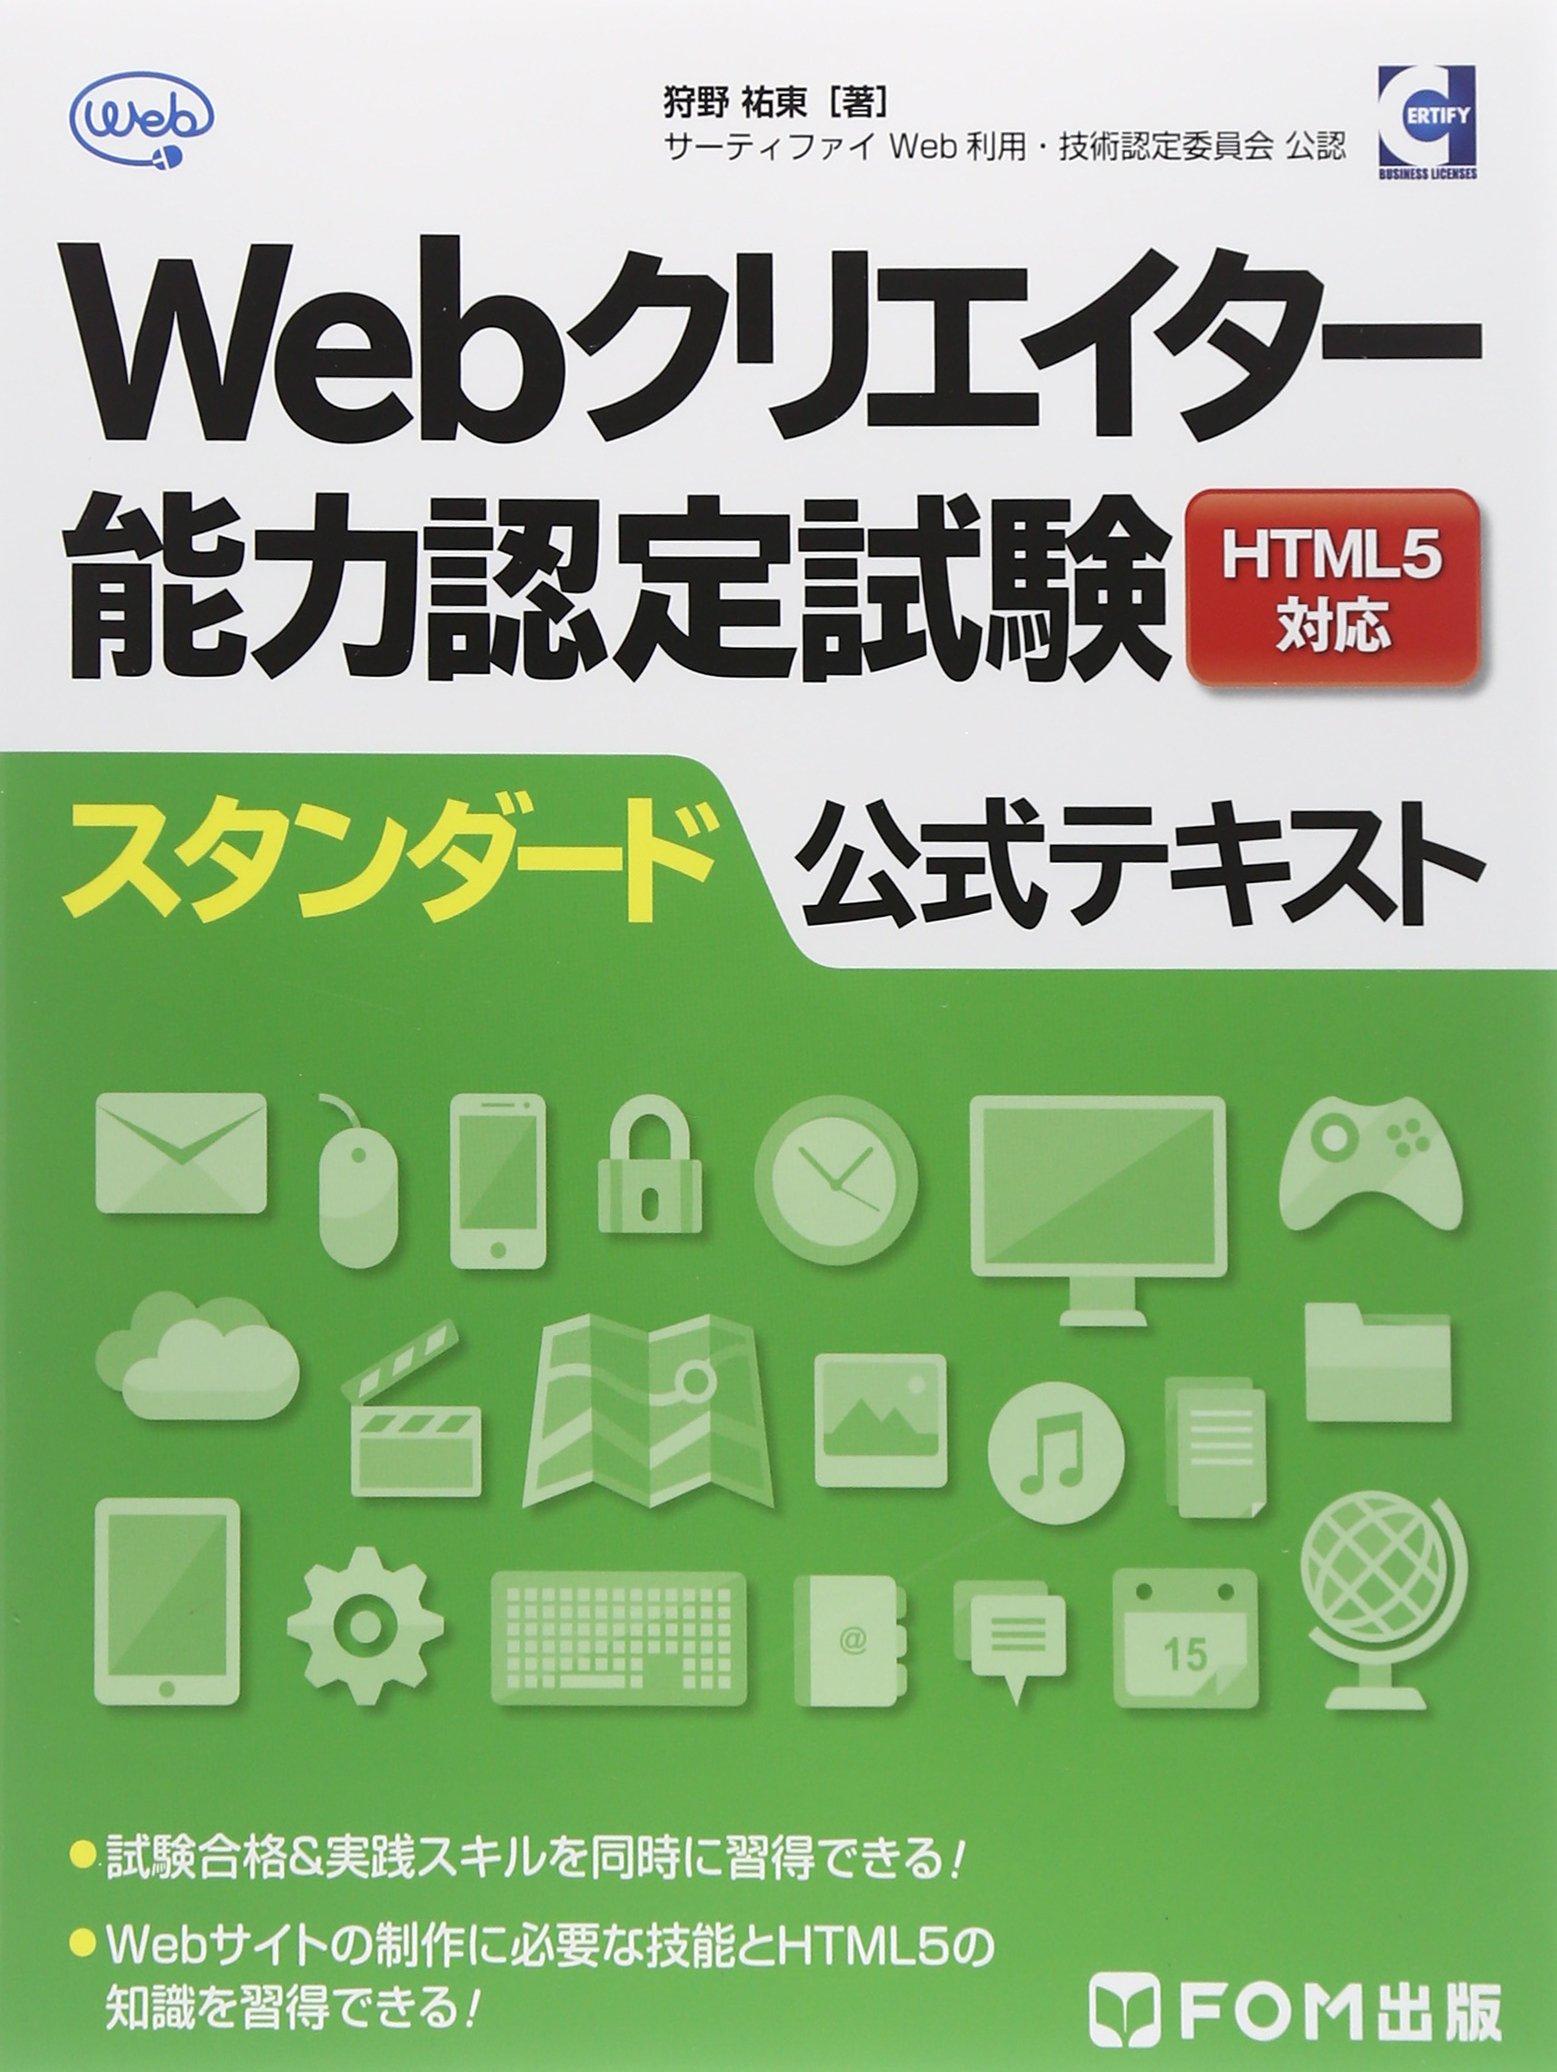 Web クリエイター 能力 認定 試験 Webクリエイター能力認定試験|資格検定のサーティファイ